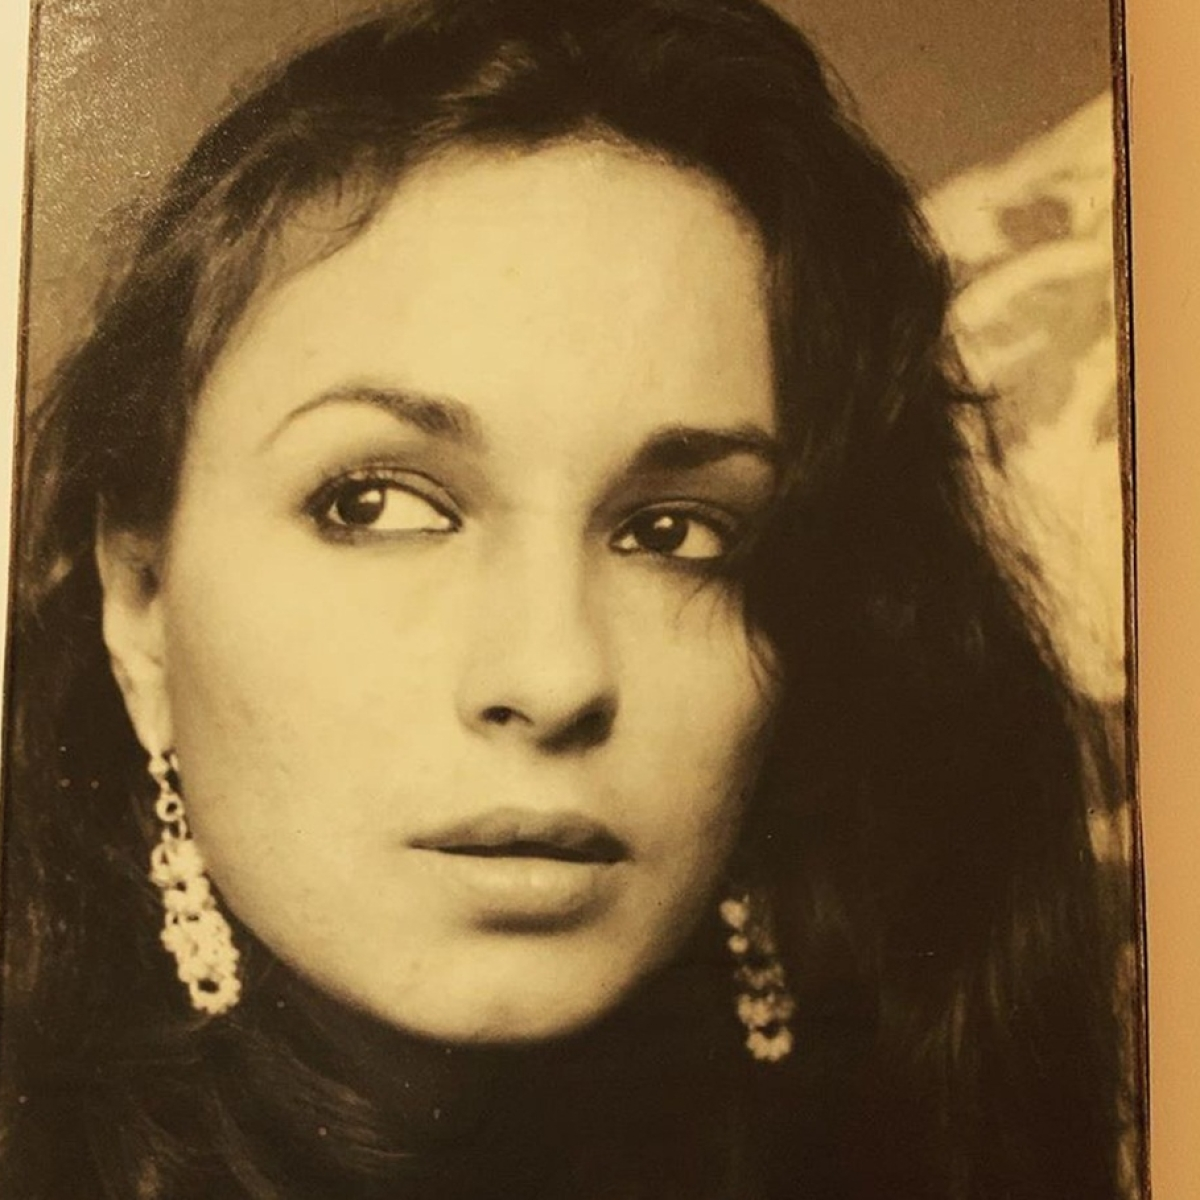 Soni Razdan shares throwback image, fans compare her to Alia Bhatt